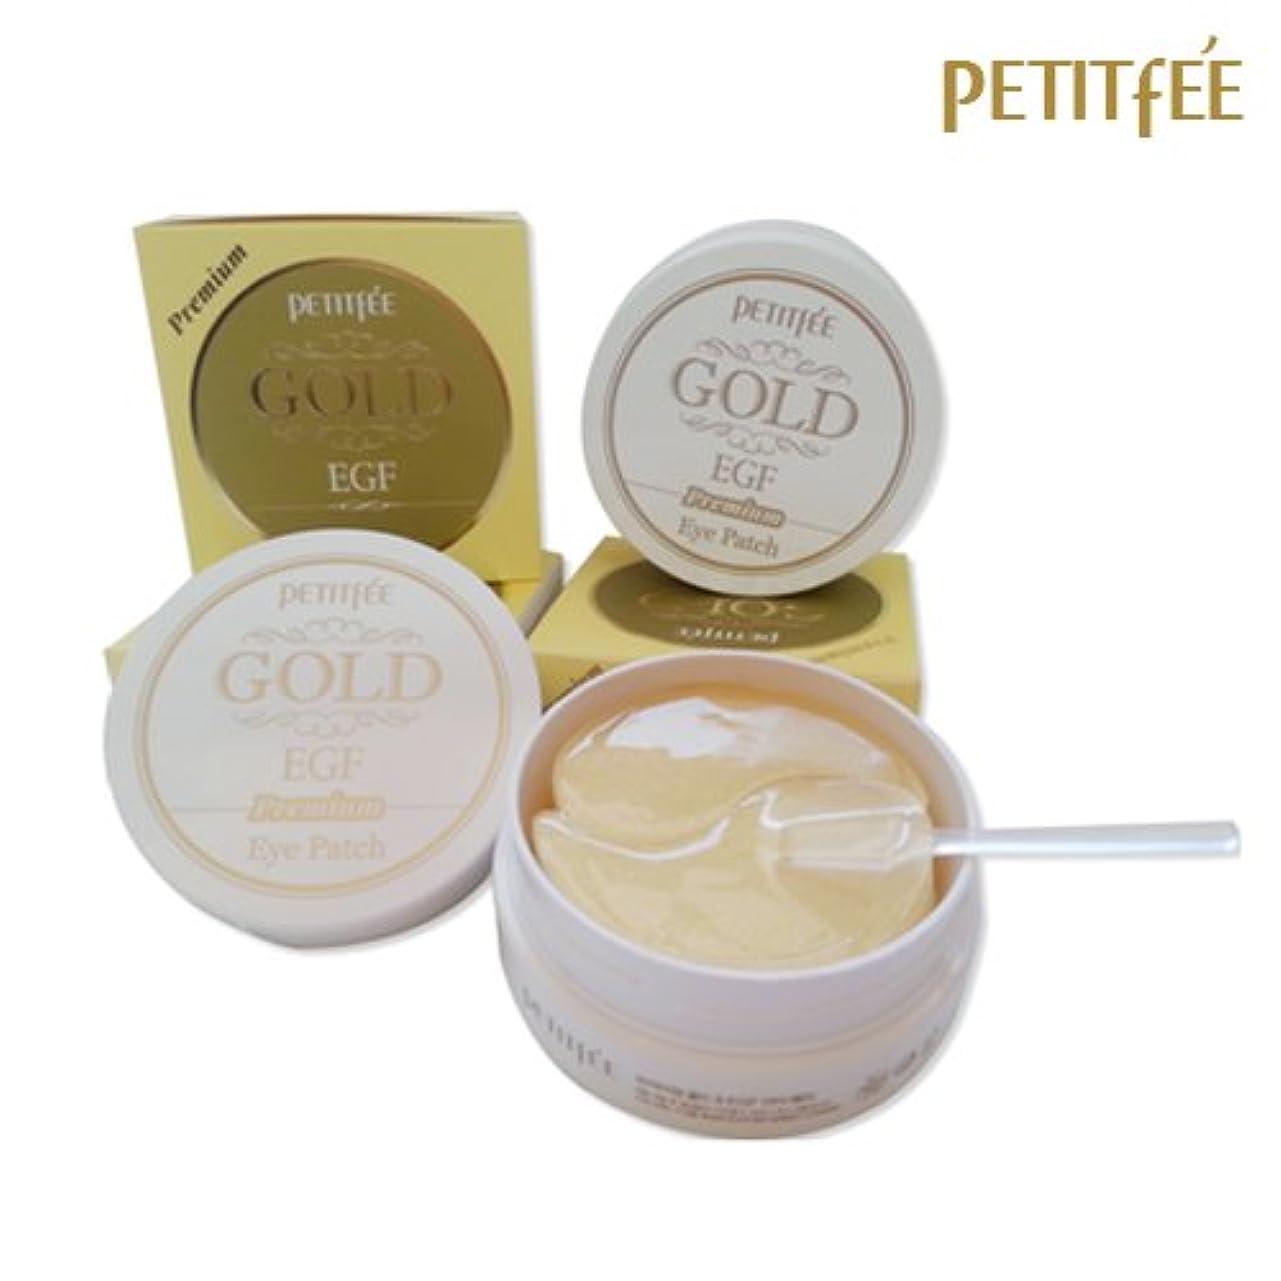 Petitfee GOLD&EGF アイ&スポットパッチ [海外直送品]